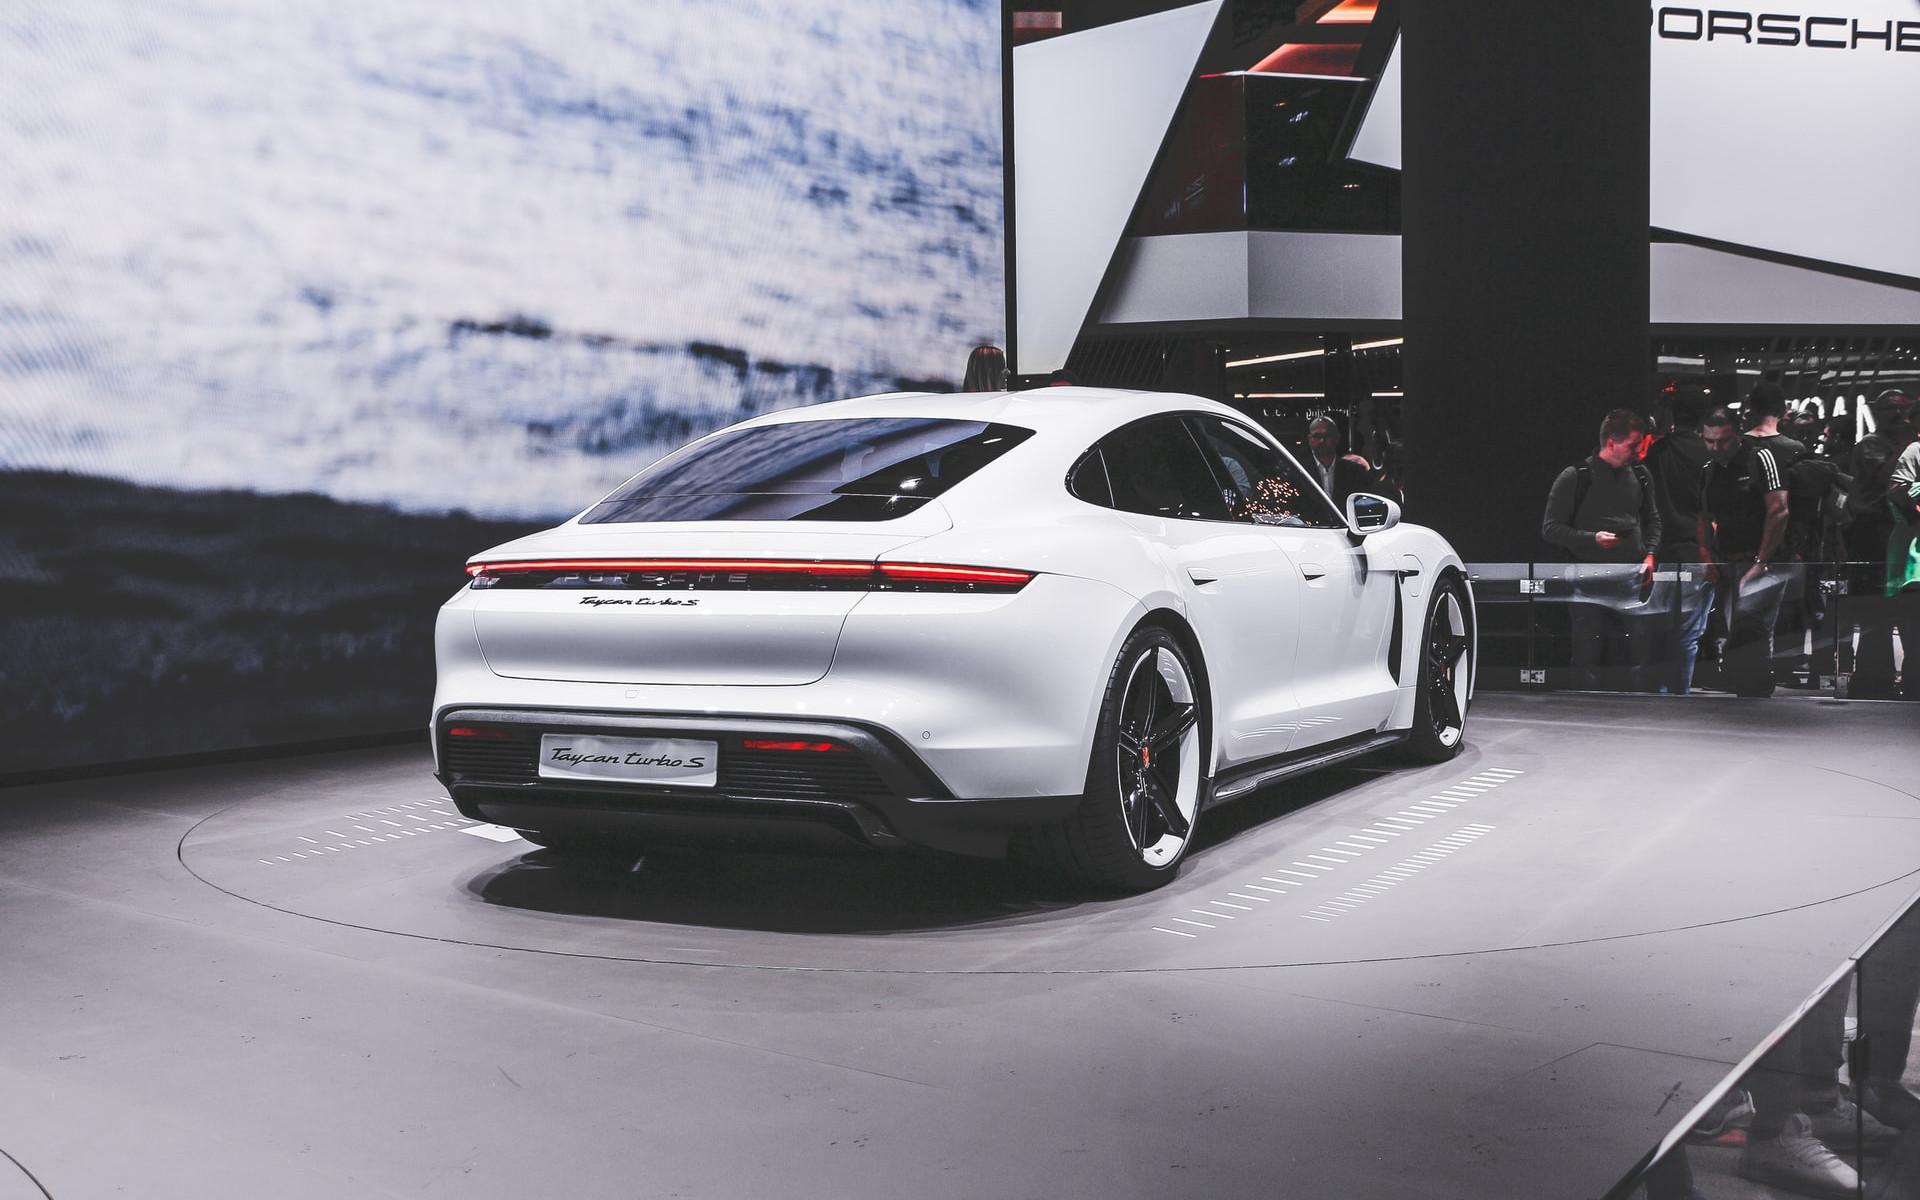 elektro automobil u Njemačkoj